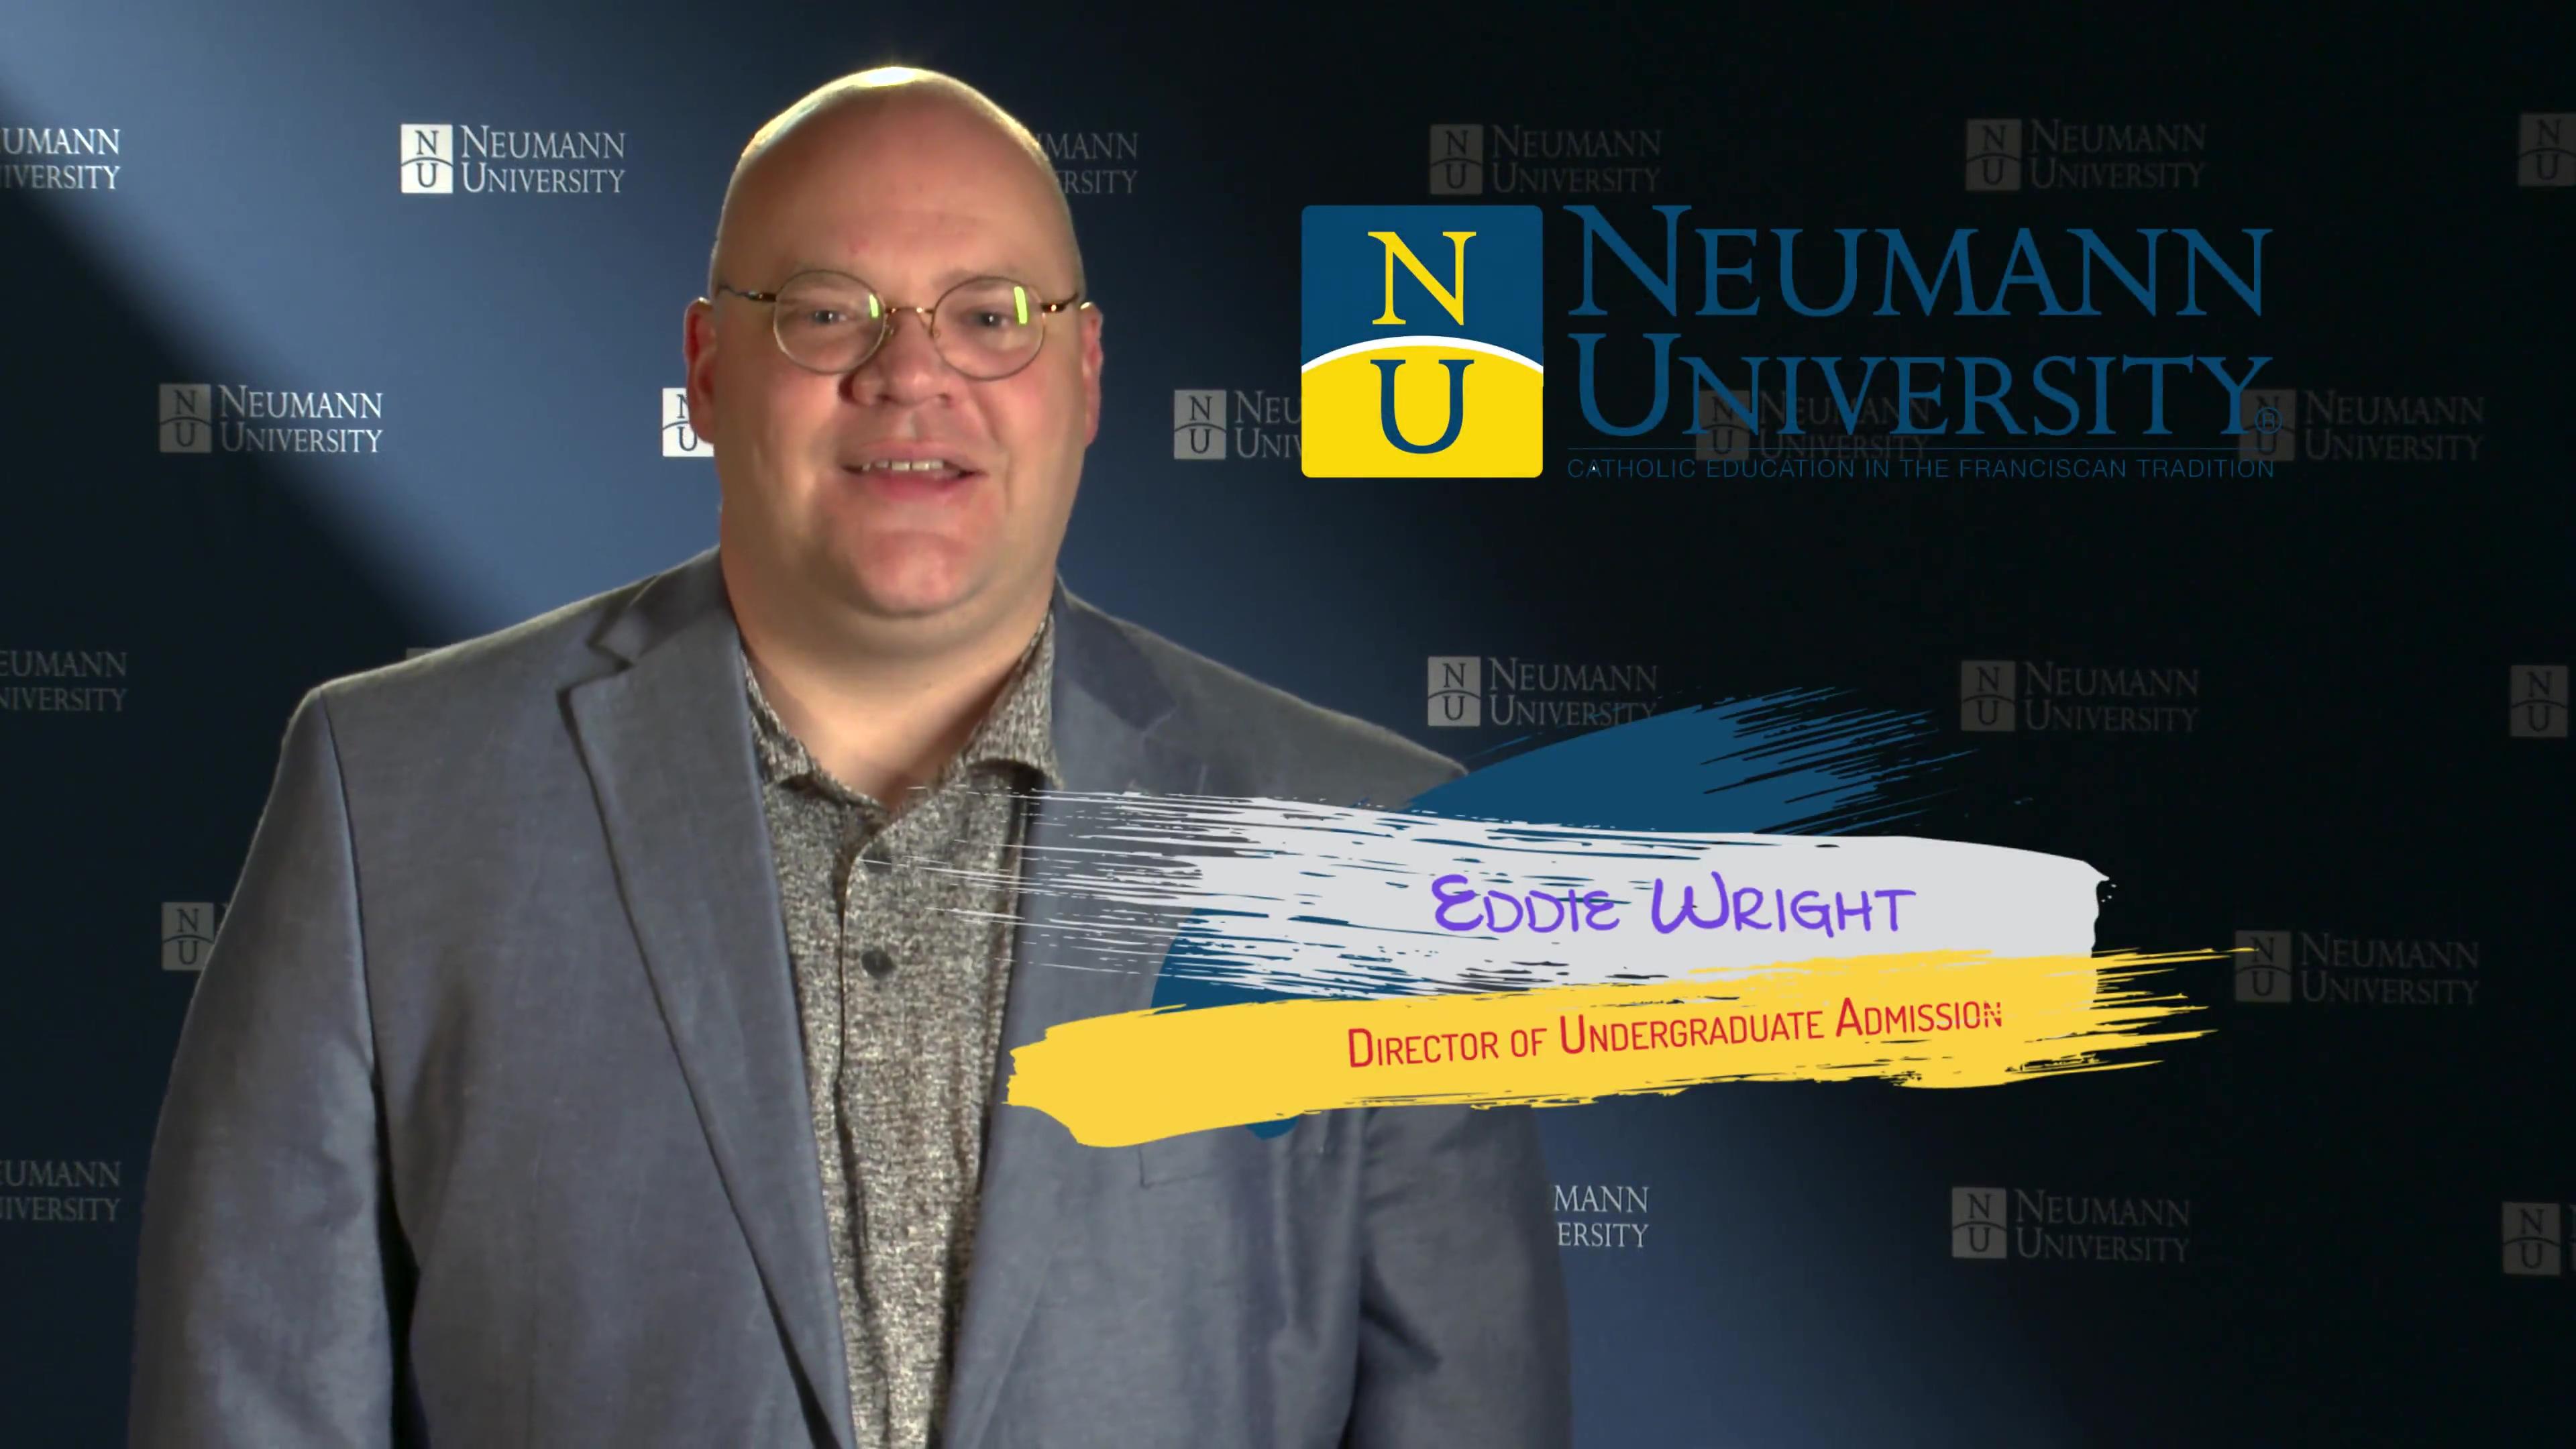 Neumann University - Director of Undergraduate Admissions Edward Wright